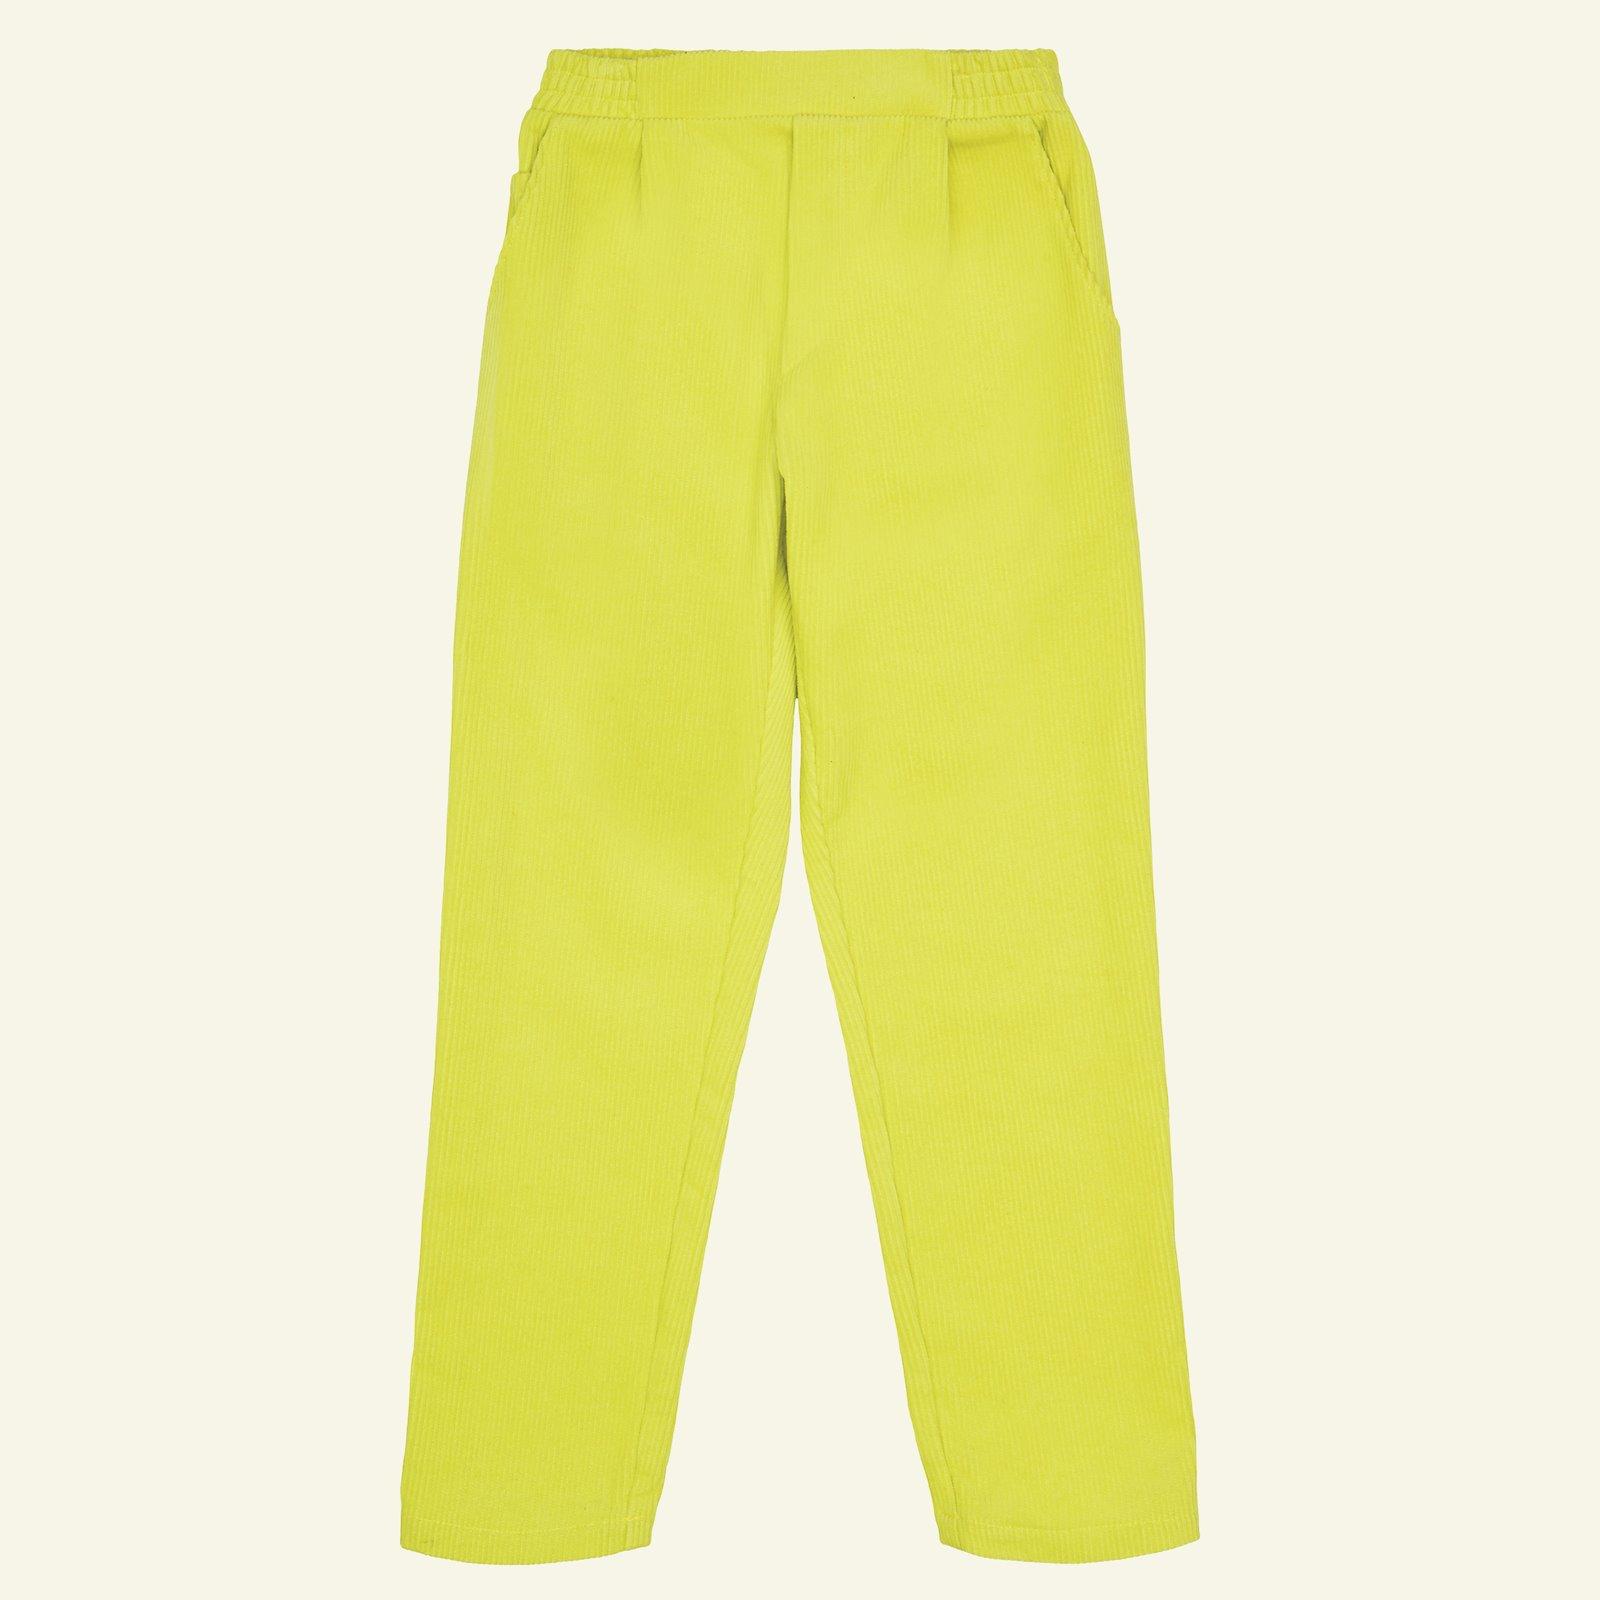 Chino pants, 134/9y p60033_430822_sskit